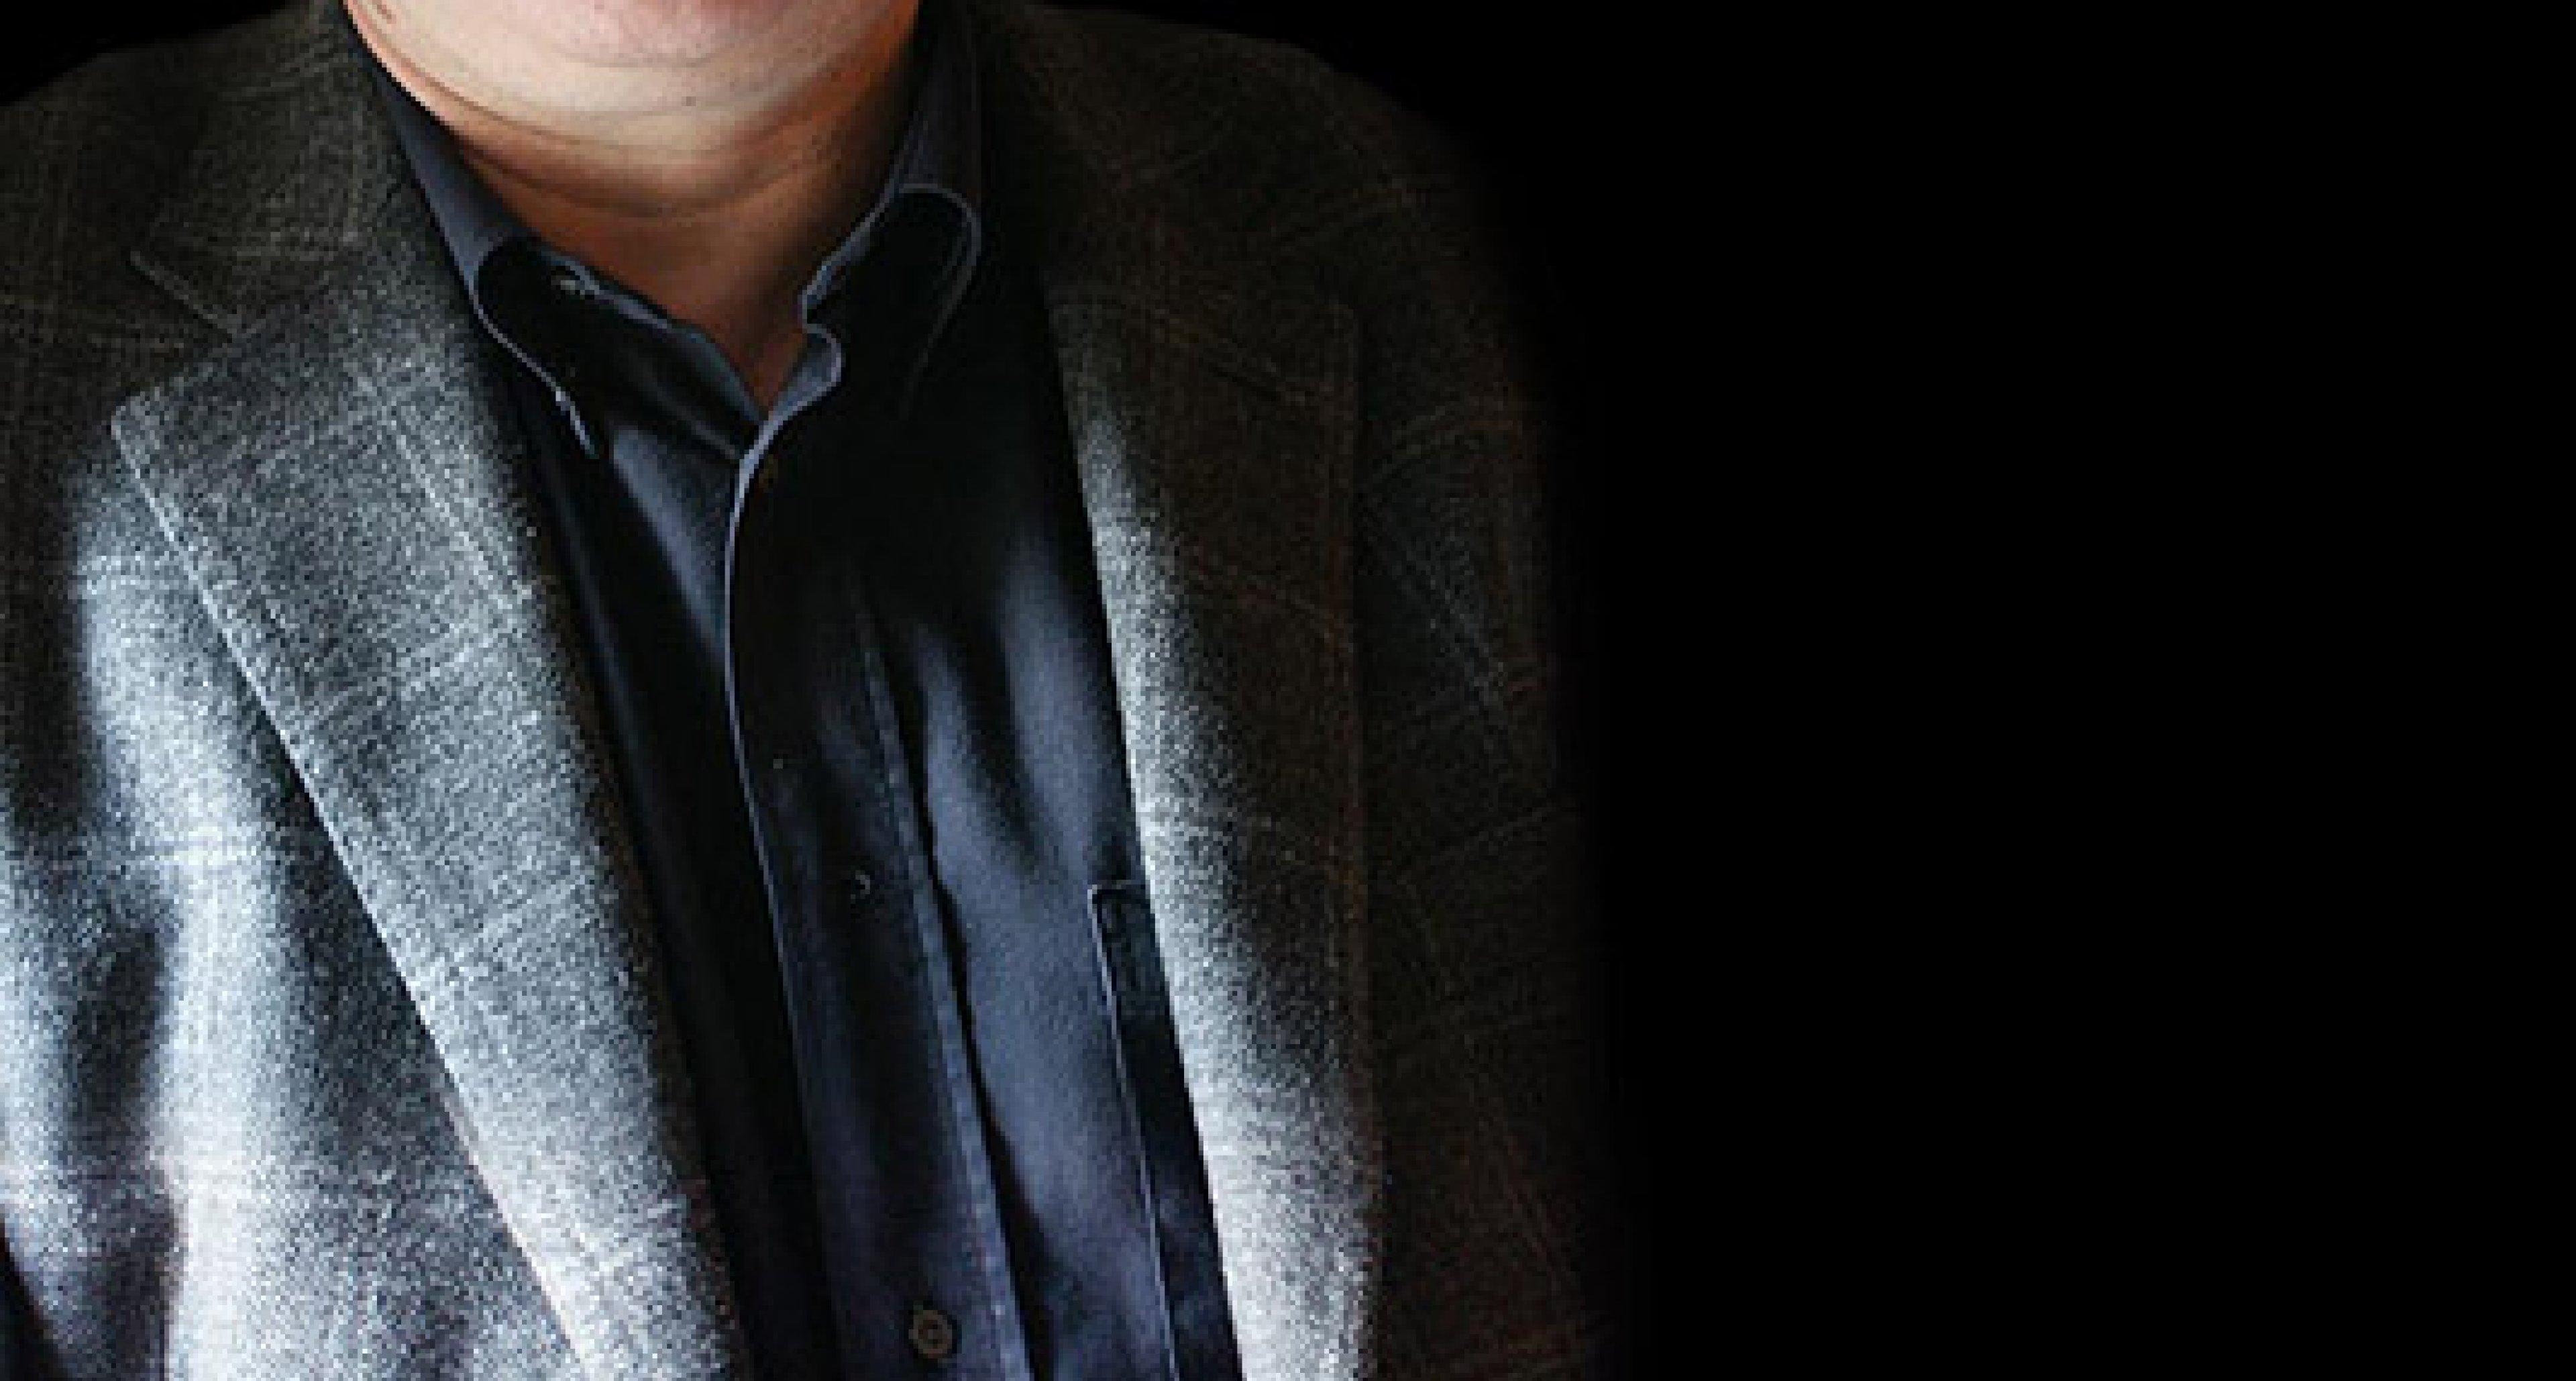 Interview: Ferrán Adrià, Koch und Gastronom